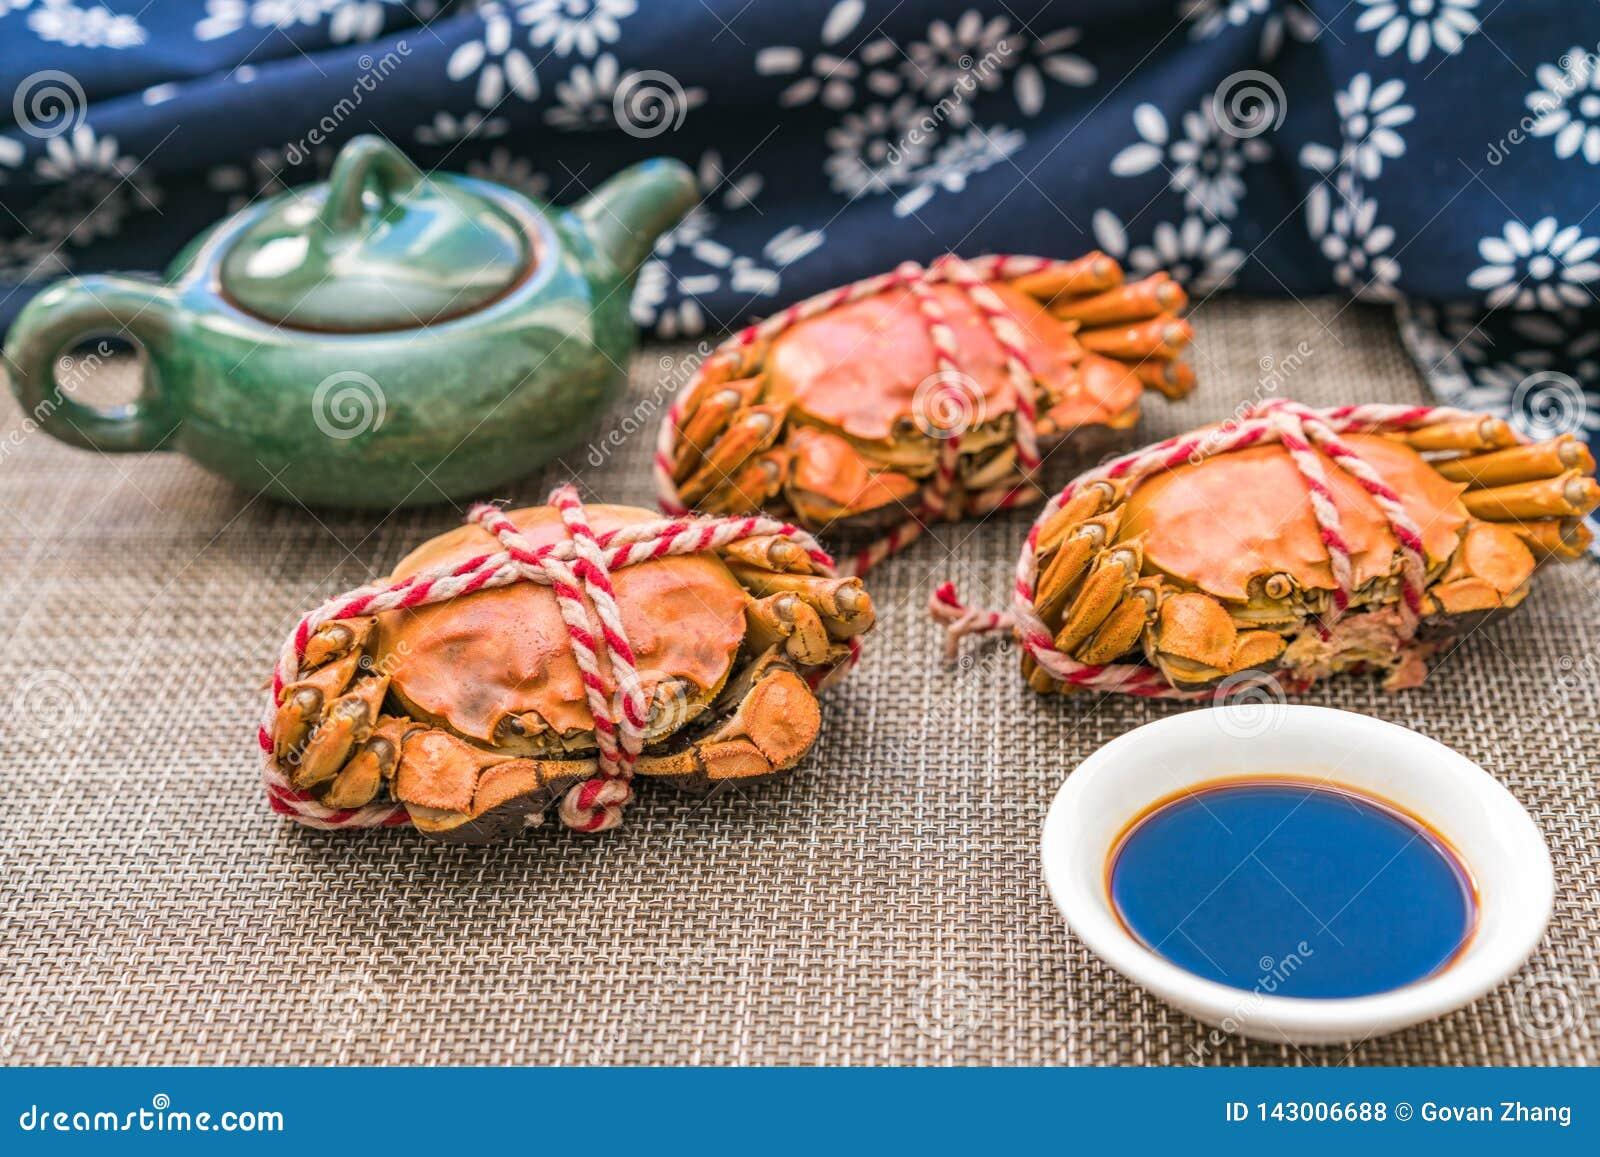 Odparowany krab, delikatność Chongyang festiwal w Chiny